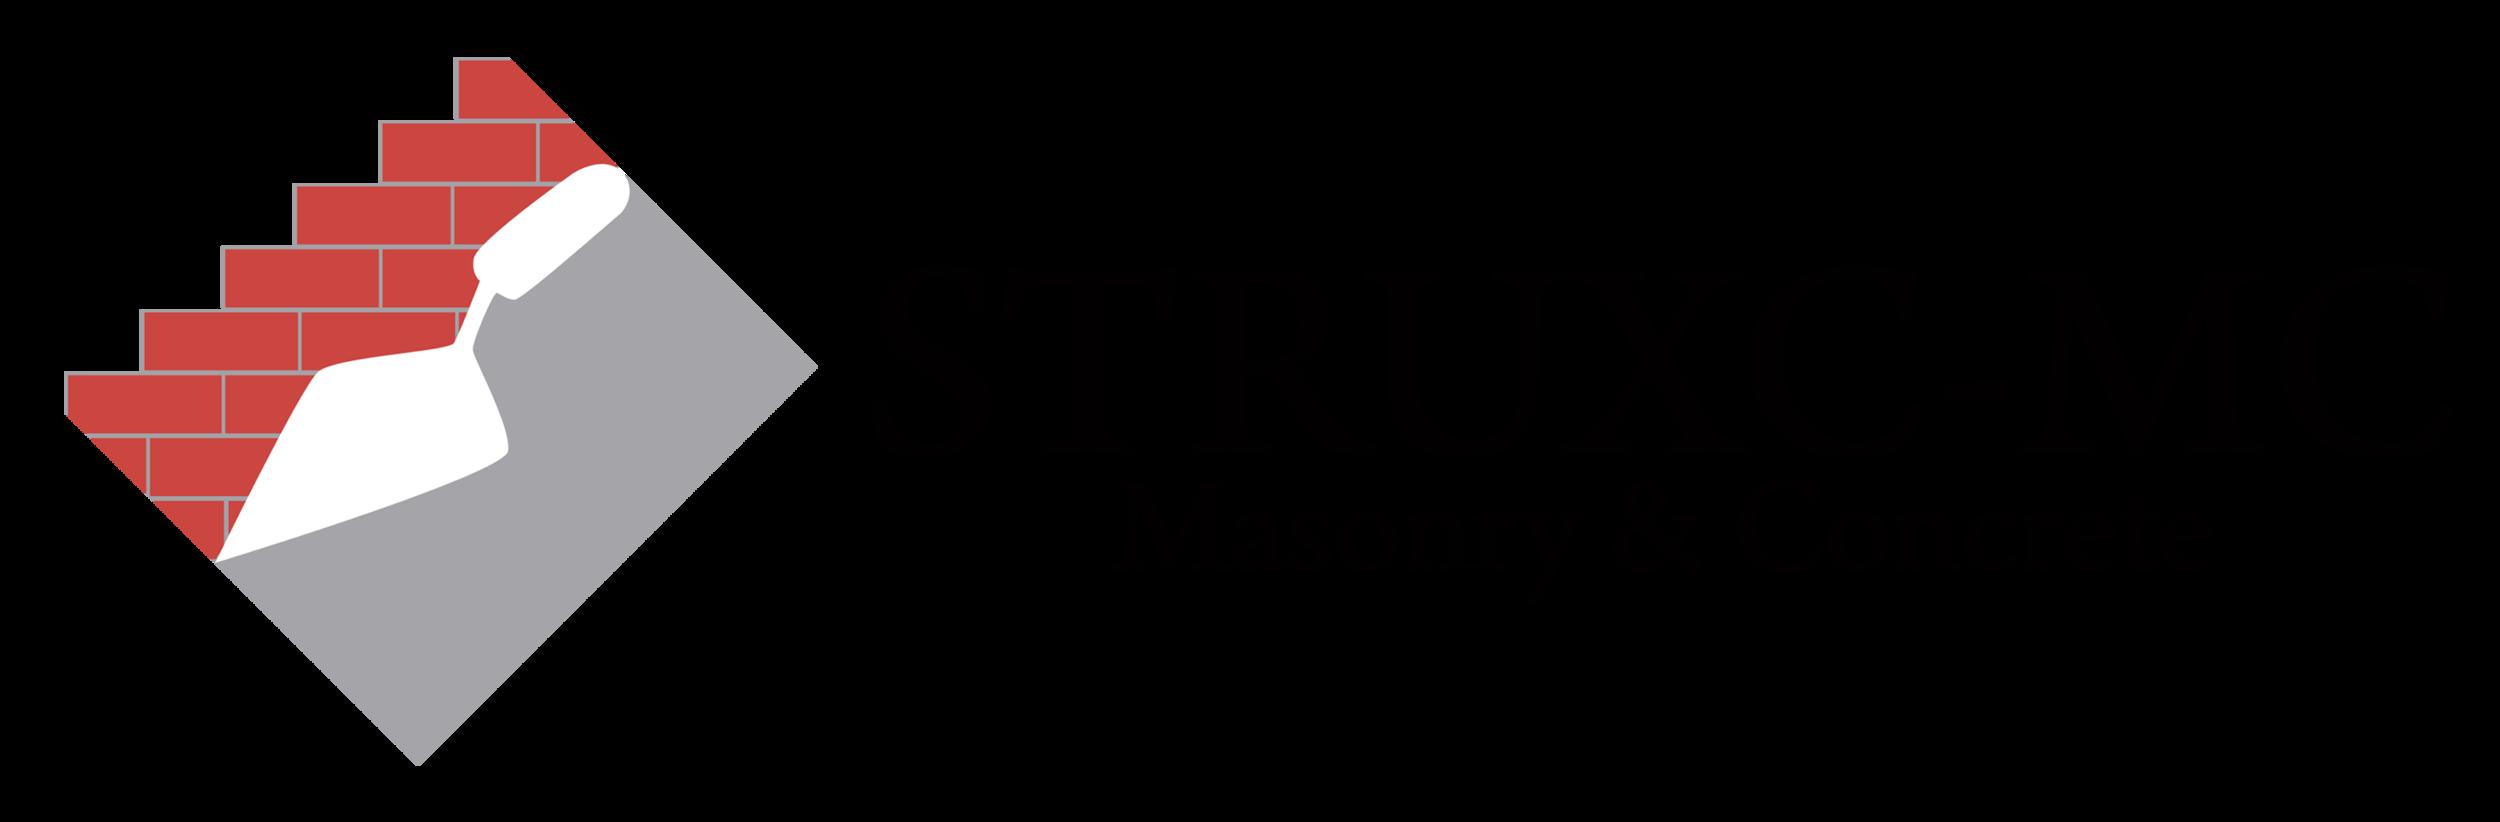 StruxCMC logo w MC.png